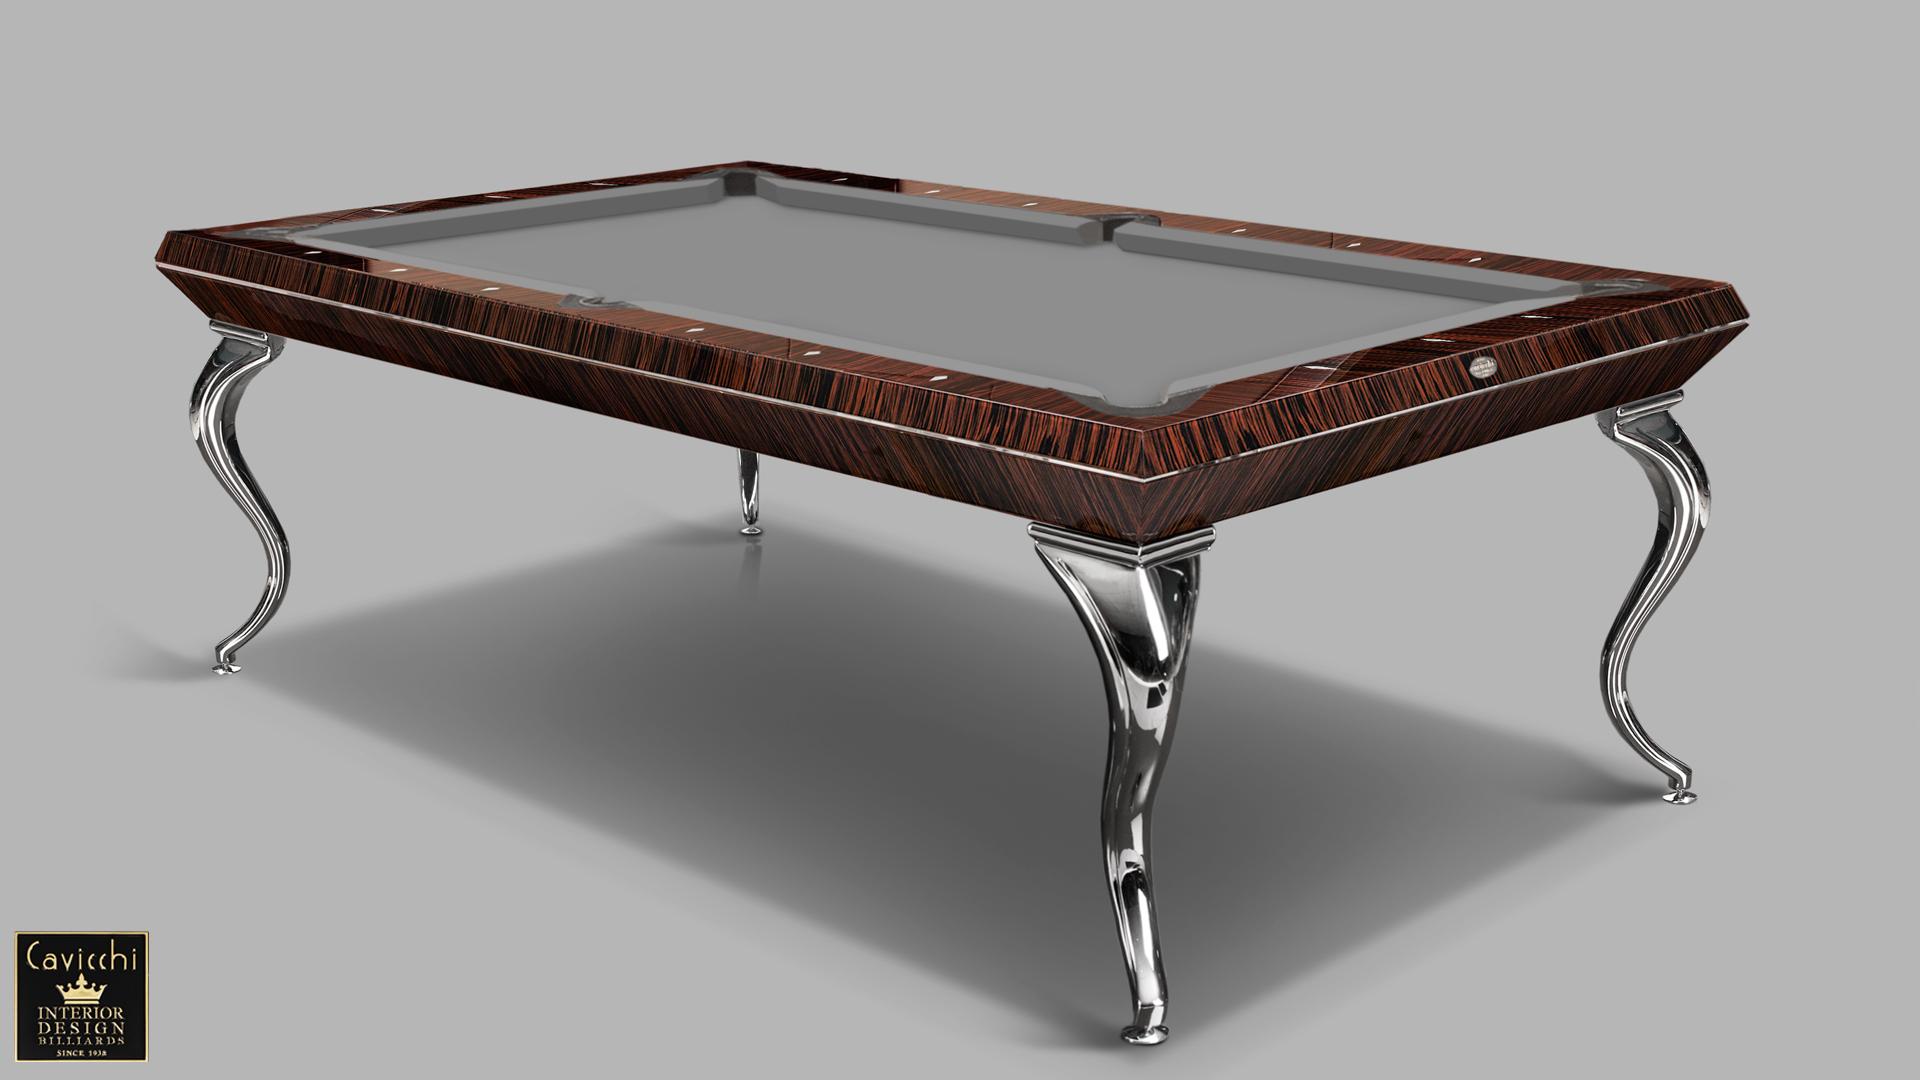 Pool Billiard Tables Opera Makassar Ebony and Zebrano 7